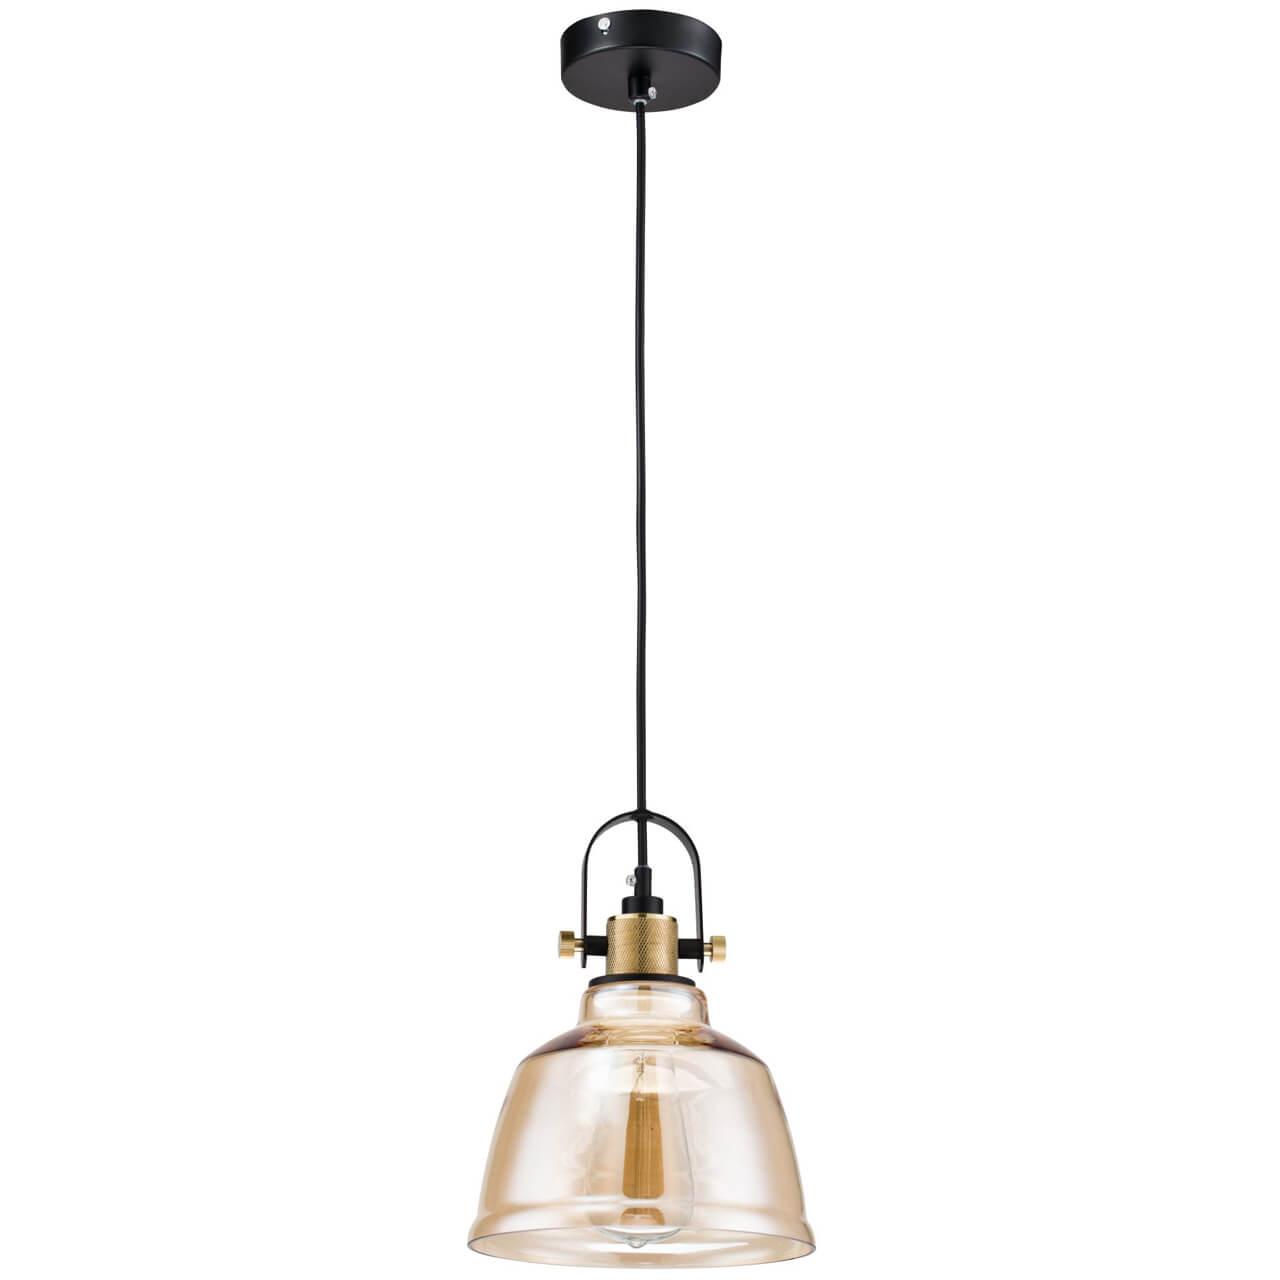 Подвесной светильник Maytoni Irving T163-11-R цена и фото